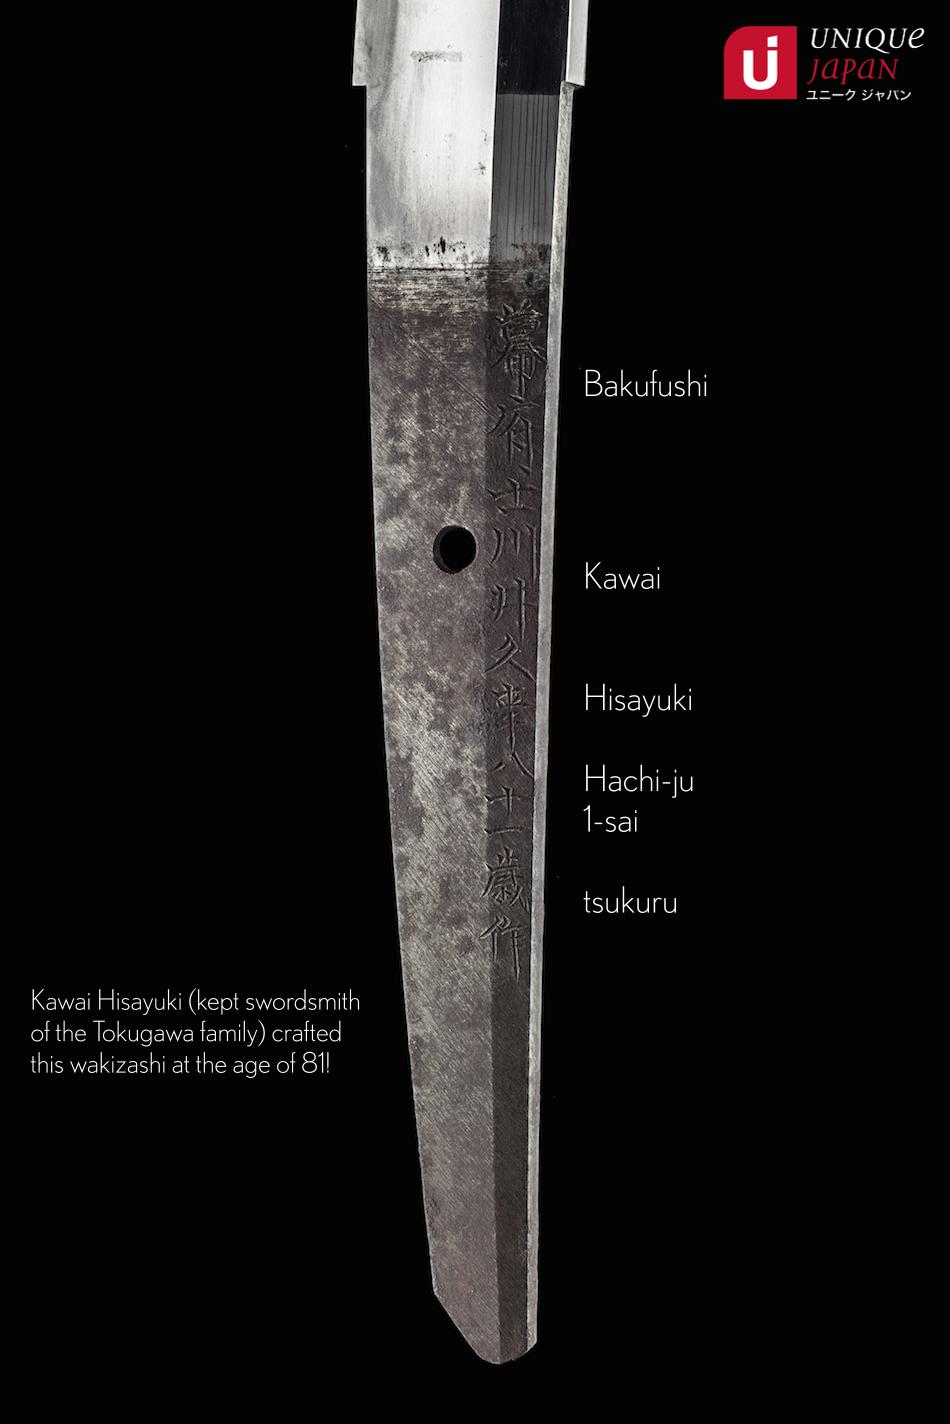 A Hisayuki Wakizashi ujwa134 Nakago - Unique Japan